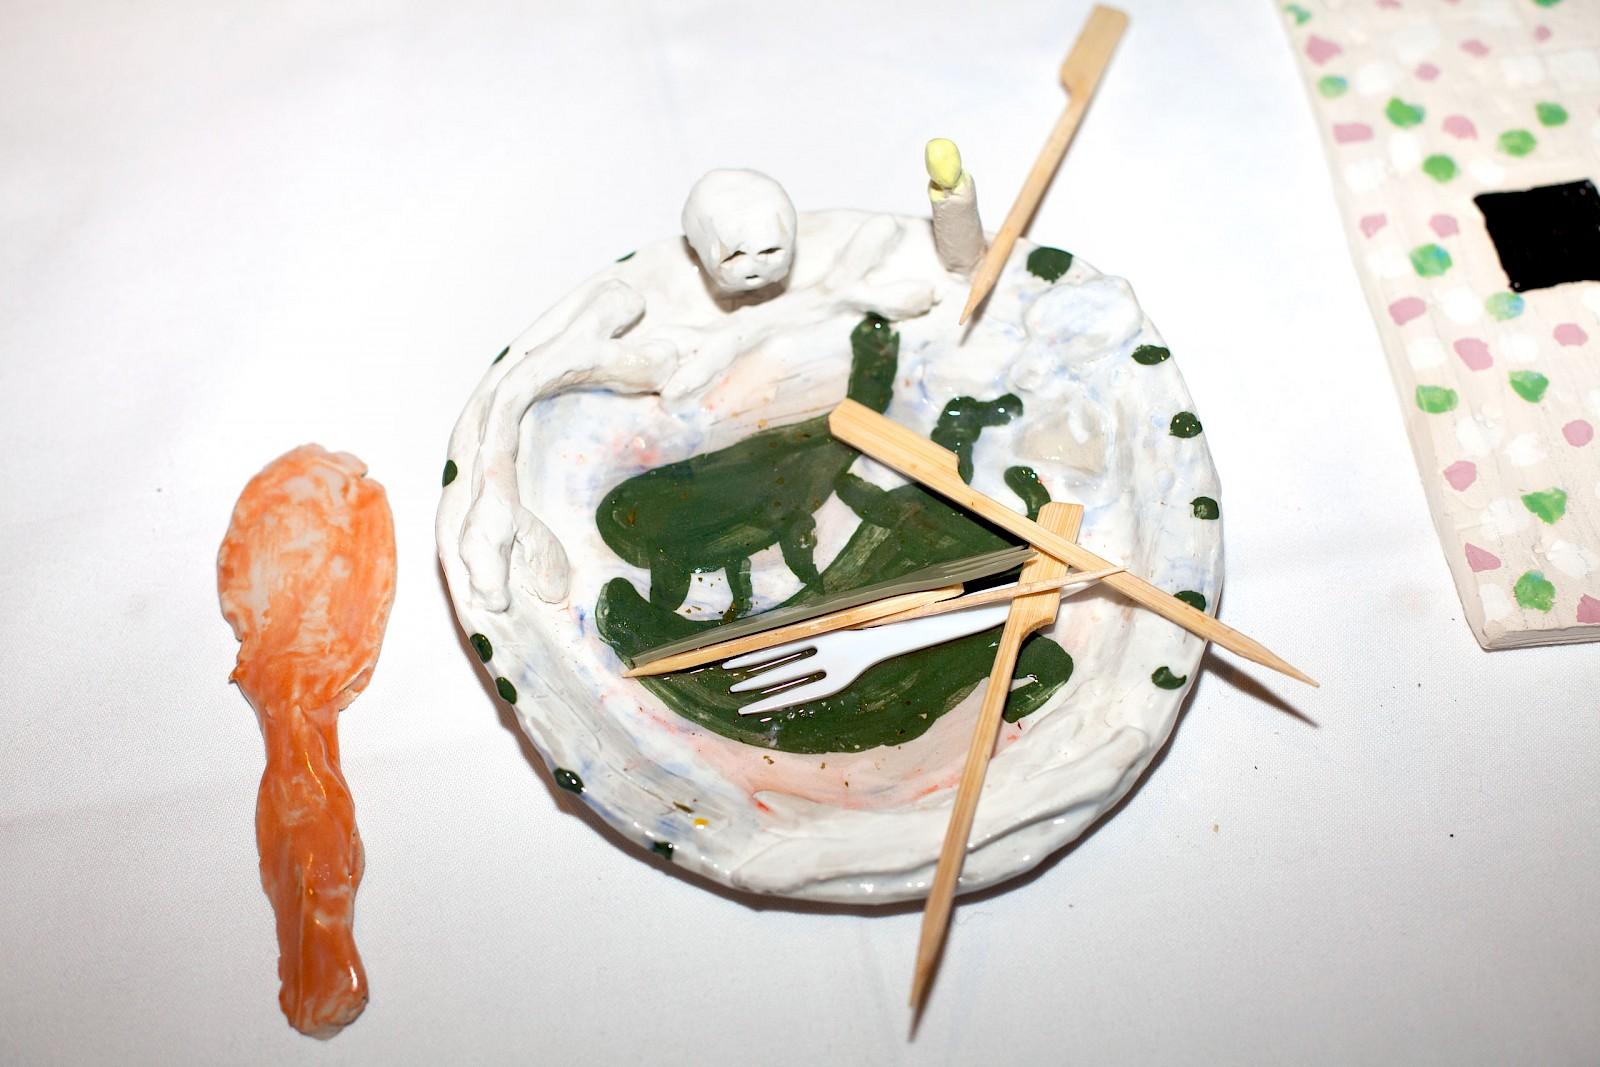 Image - Ceramics by Pia Heim & Heinz Lauener